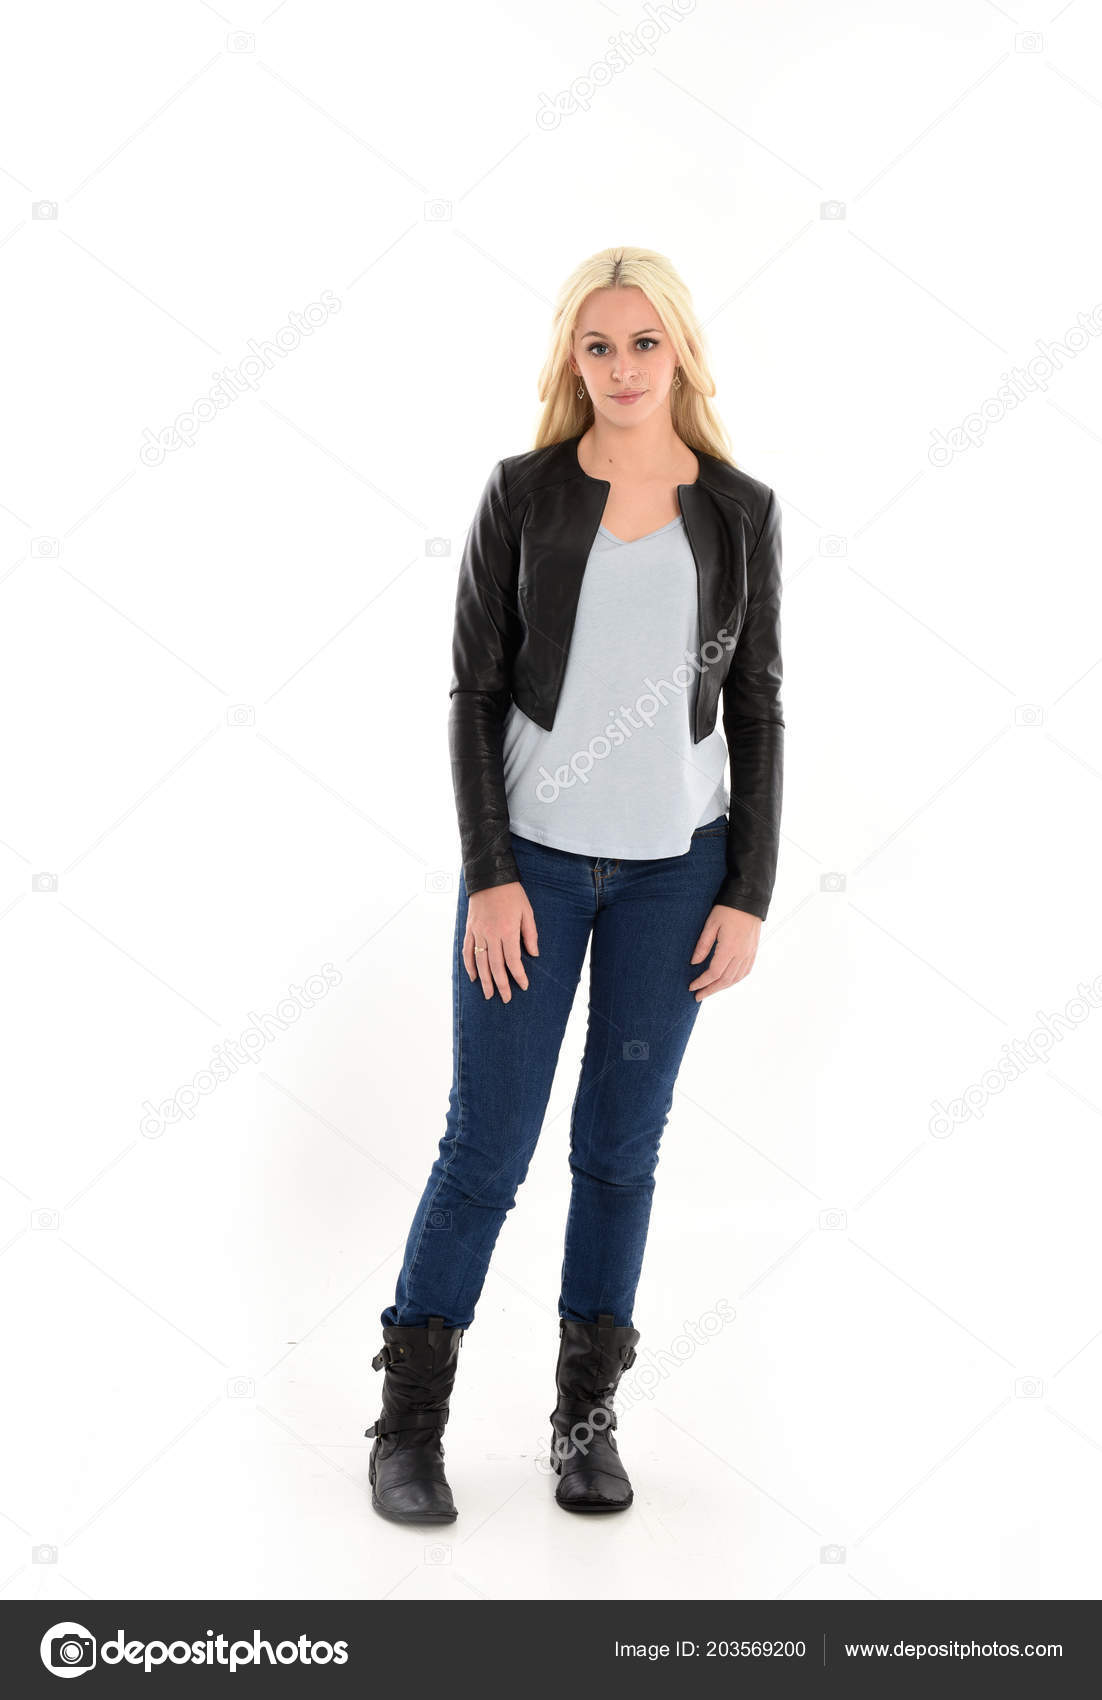 Full Length Portrait Blonde Girl Wearing Leather Jacket Jeans